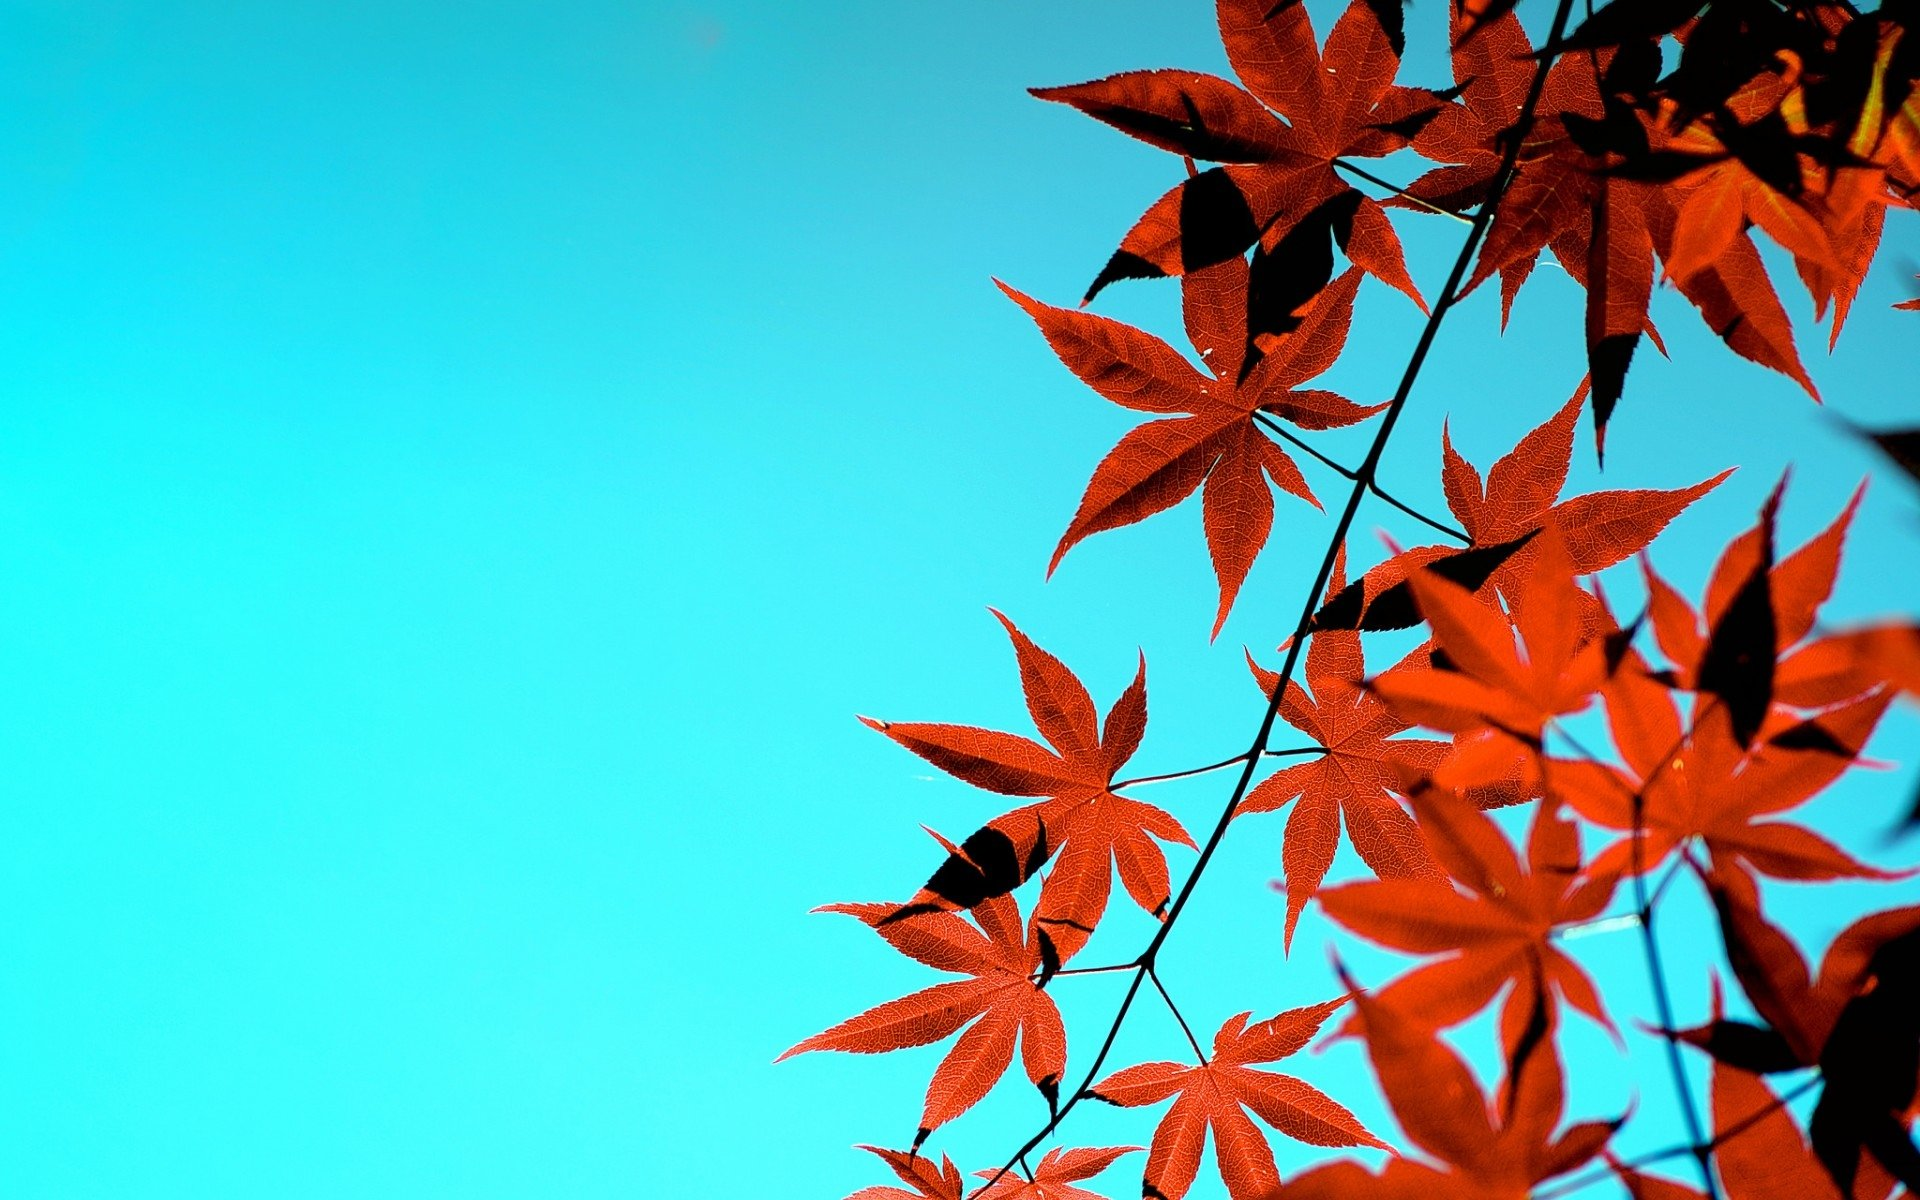 Maple Tree Fondo De Pantalla Hd Fondo De Escritorio